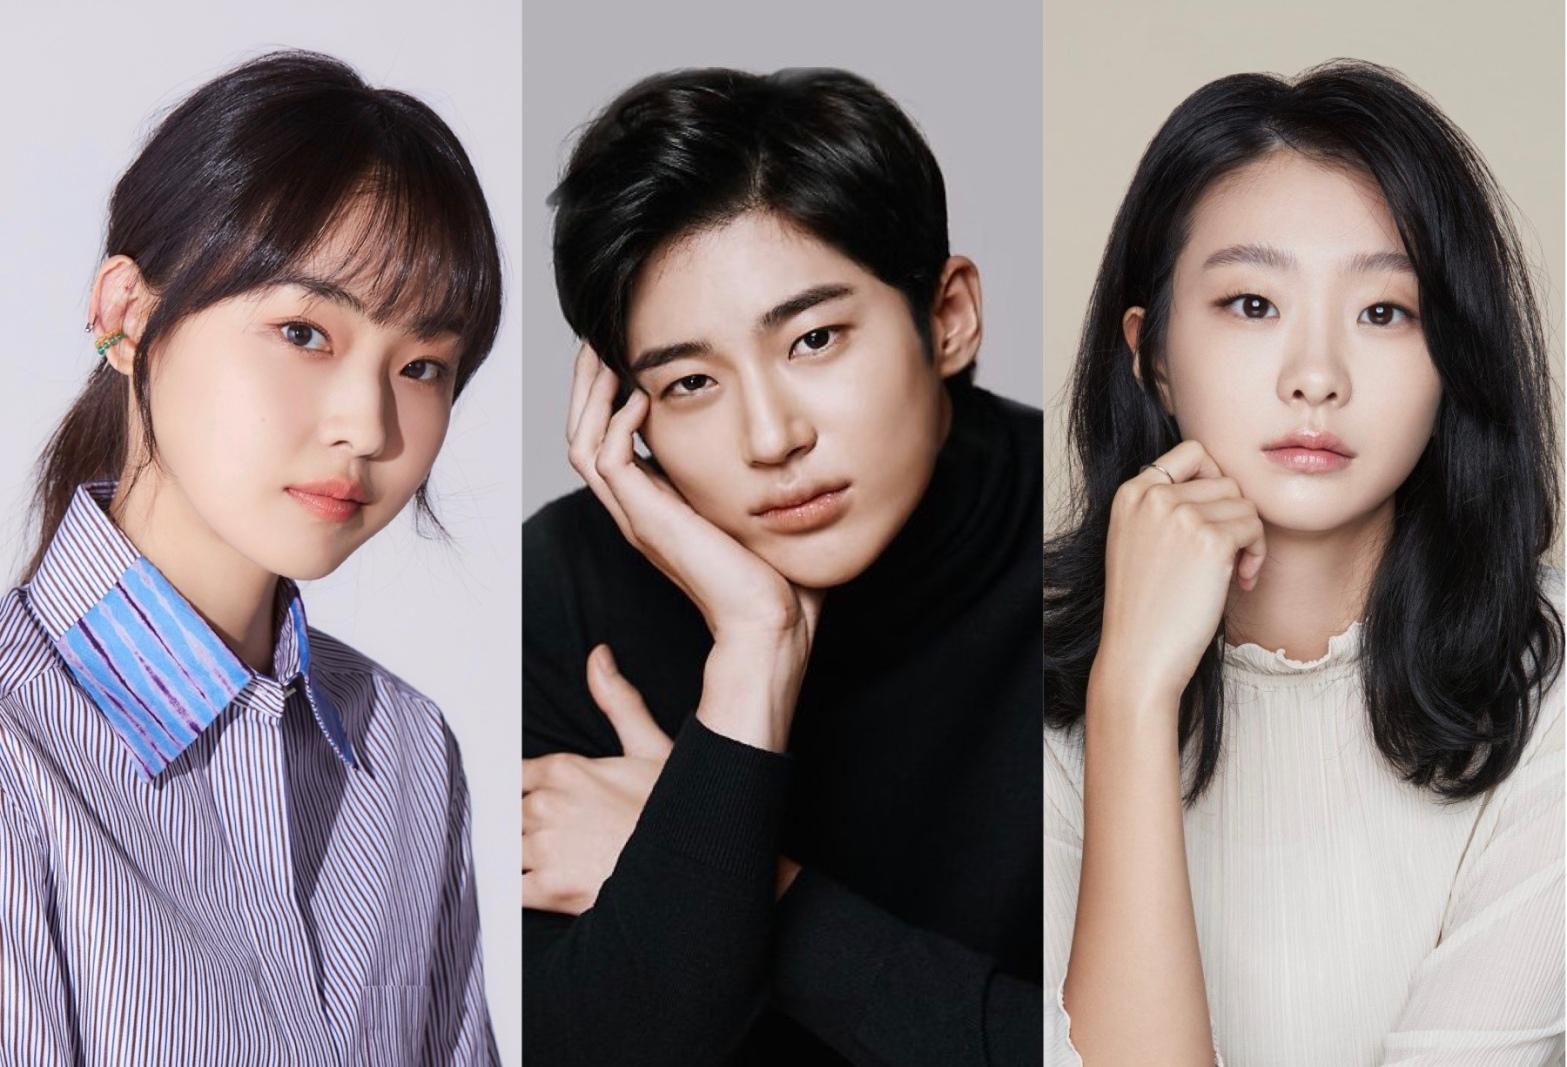 Jeon So Nee, Byun Woo Seok, Kim Da Mi all confirm for upcoming movie, Soulmate.